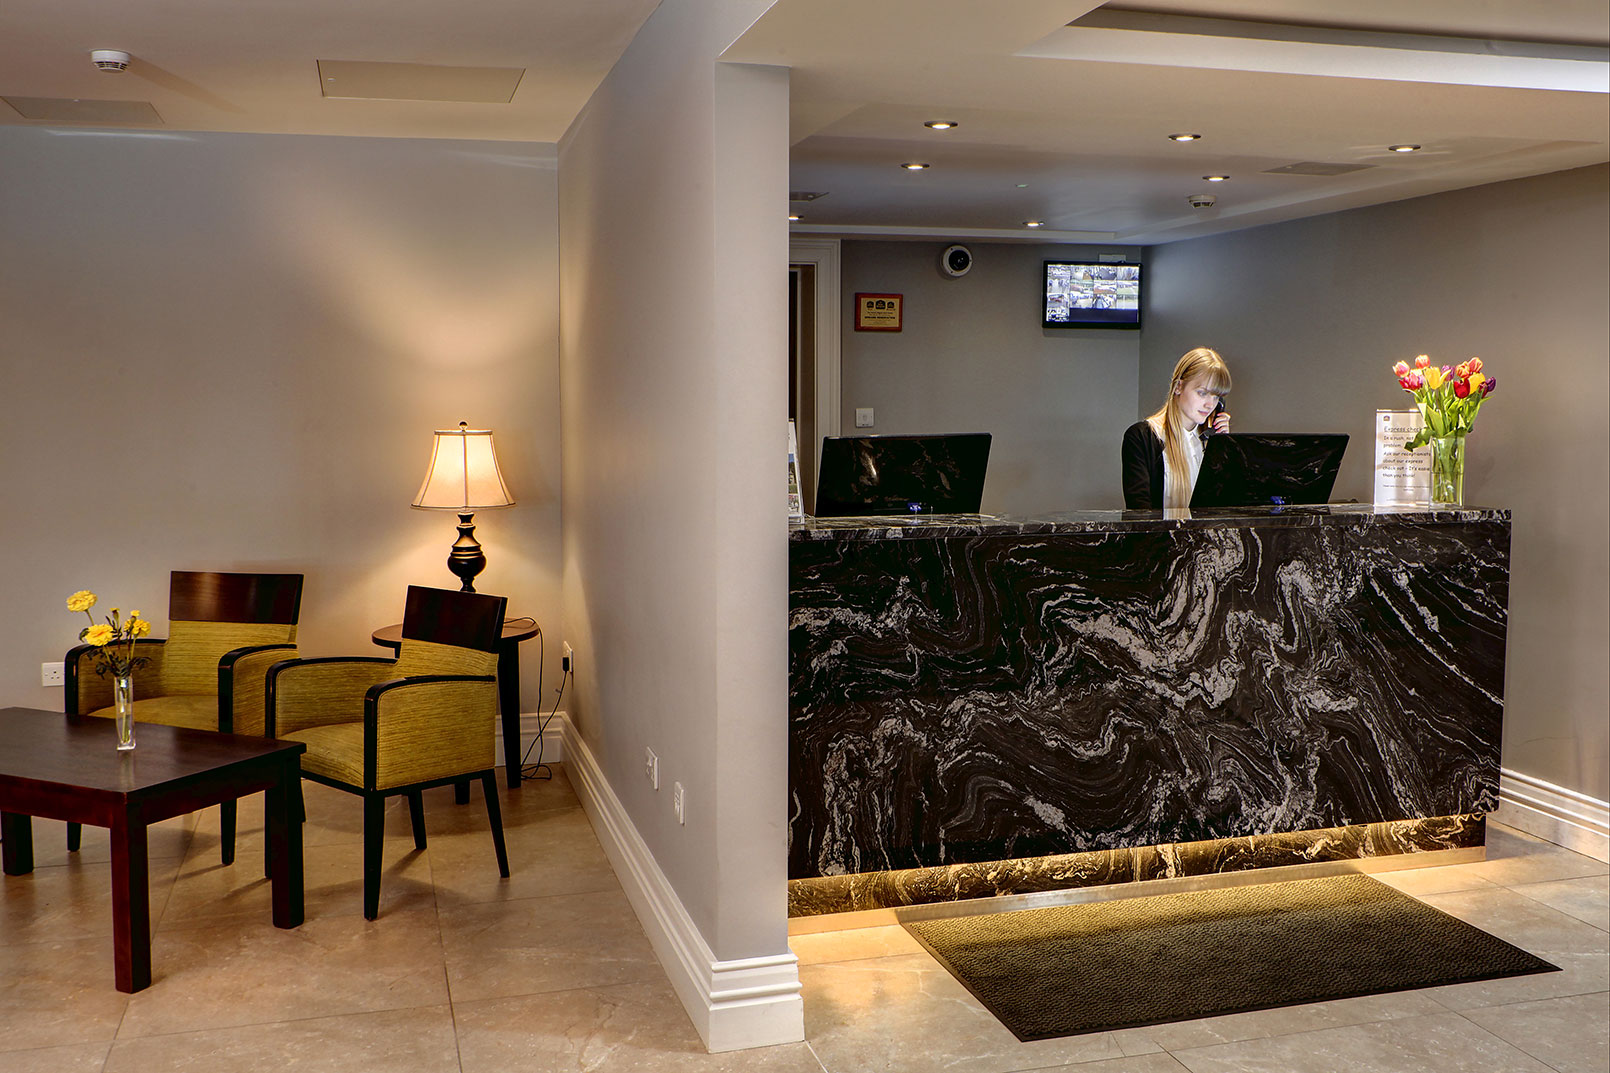 Best Western Appleby Hotel